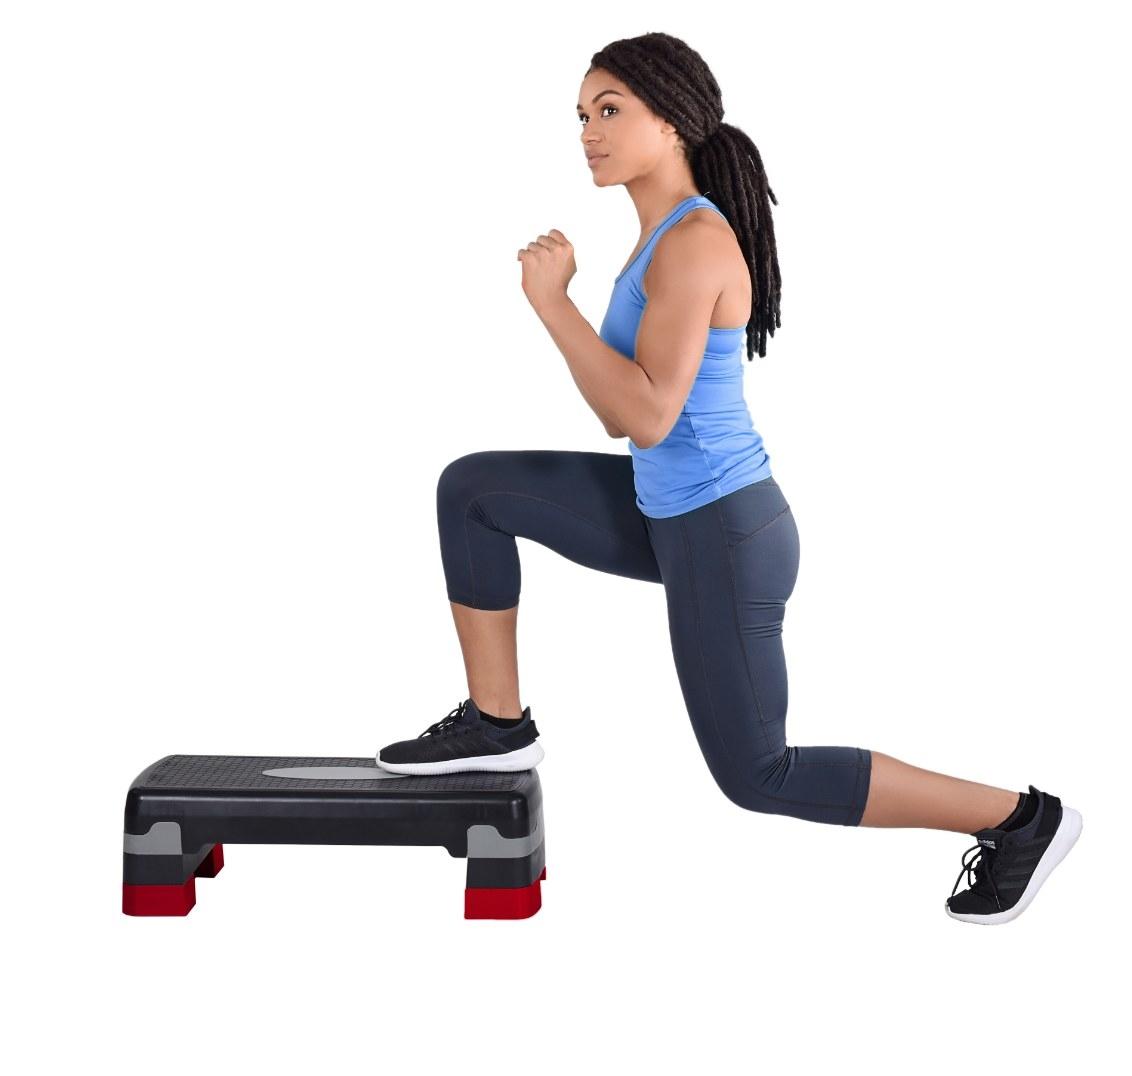 The three-level aerobic stepdeck